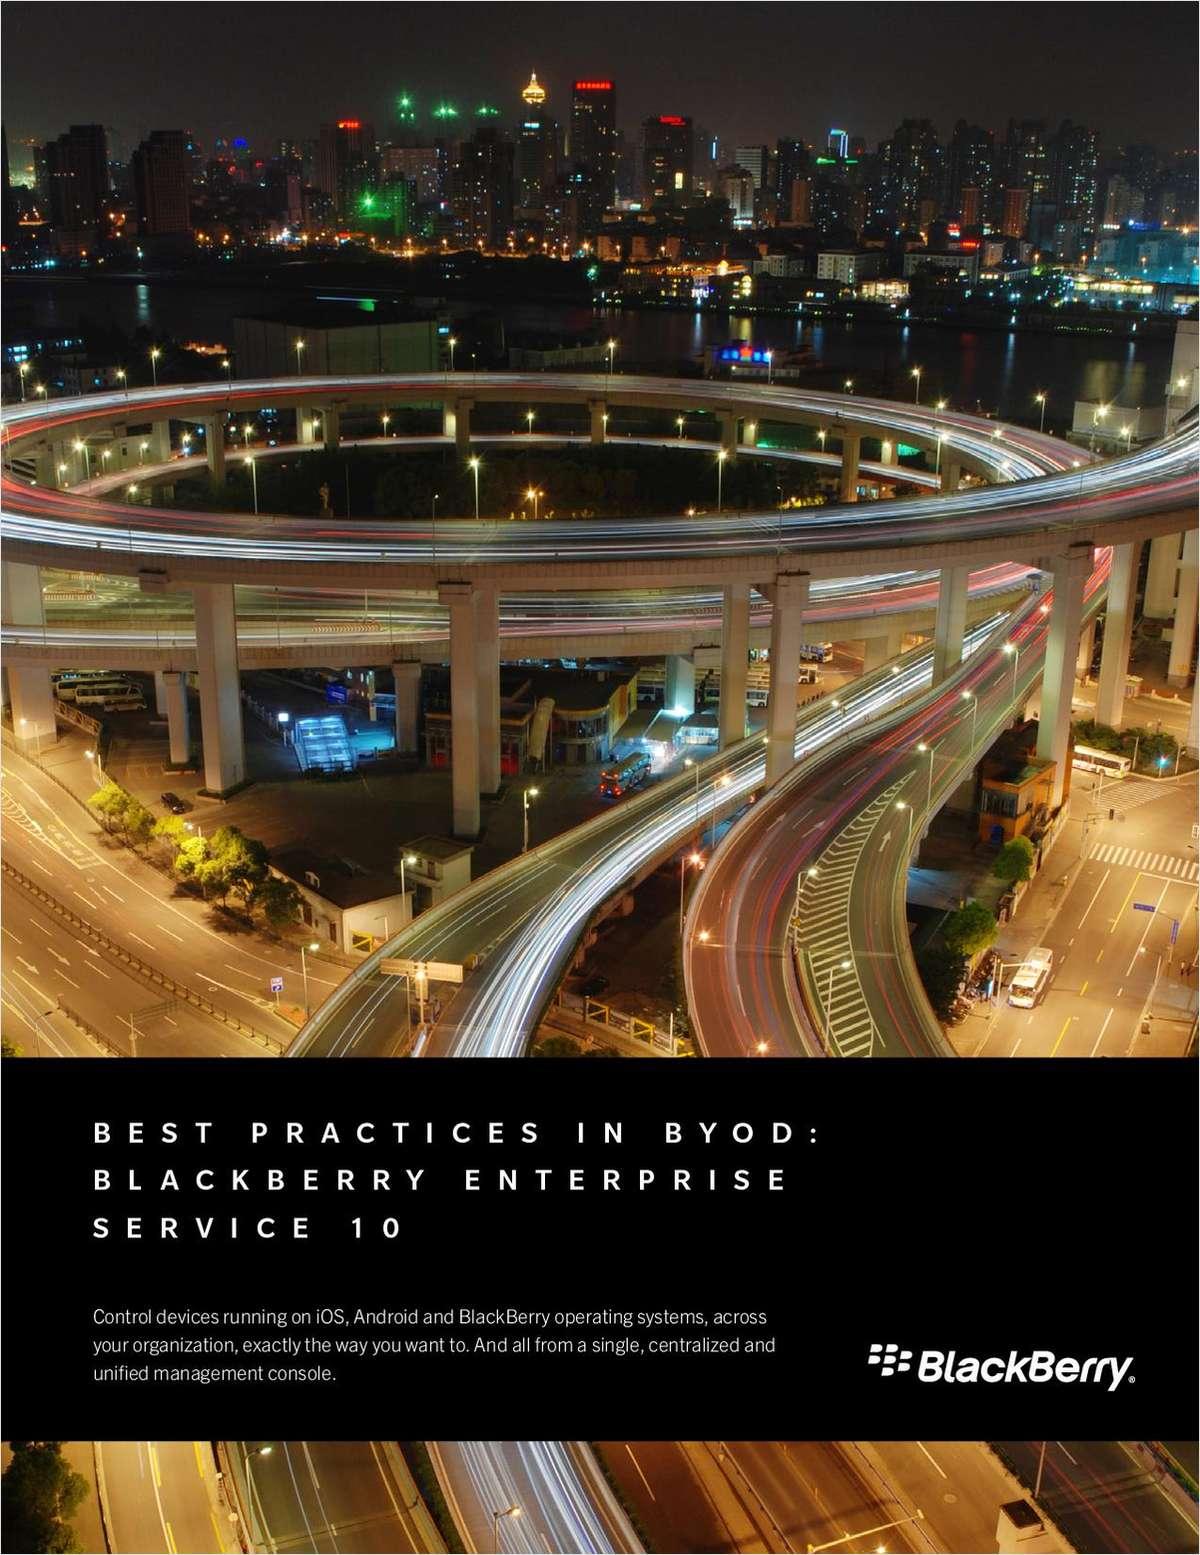 Best Practices in BYOD: BlackBerry Enterprise Service 10